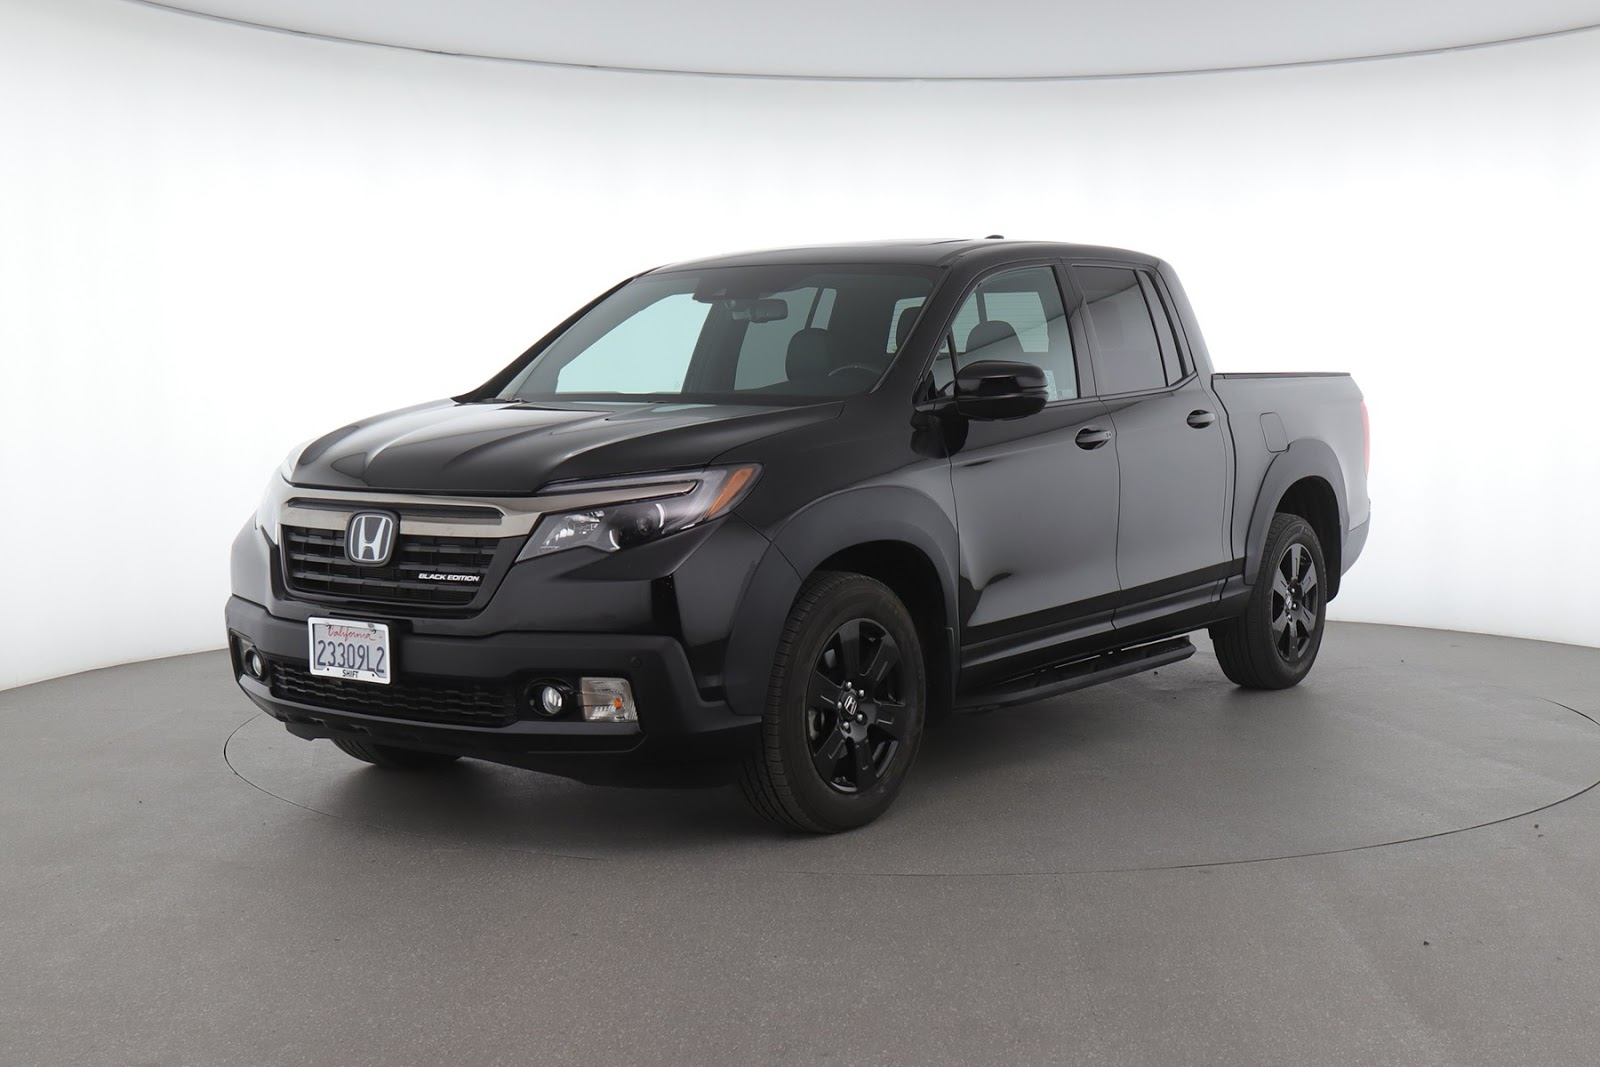 2019 Honda Ridgeline Black Edition (from $37,100)